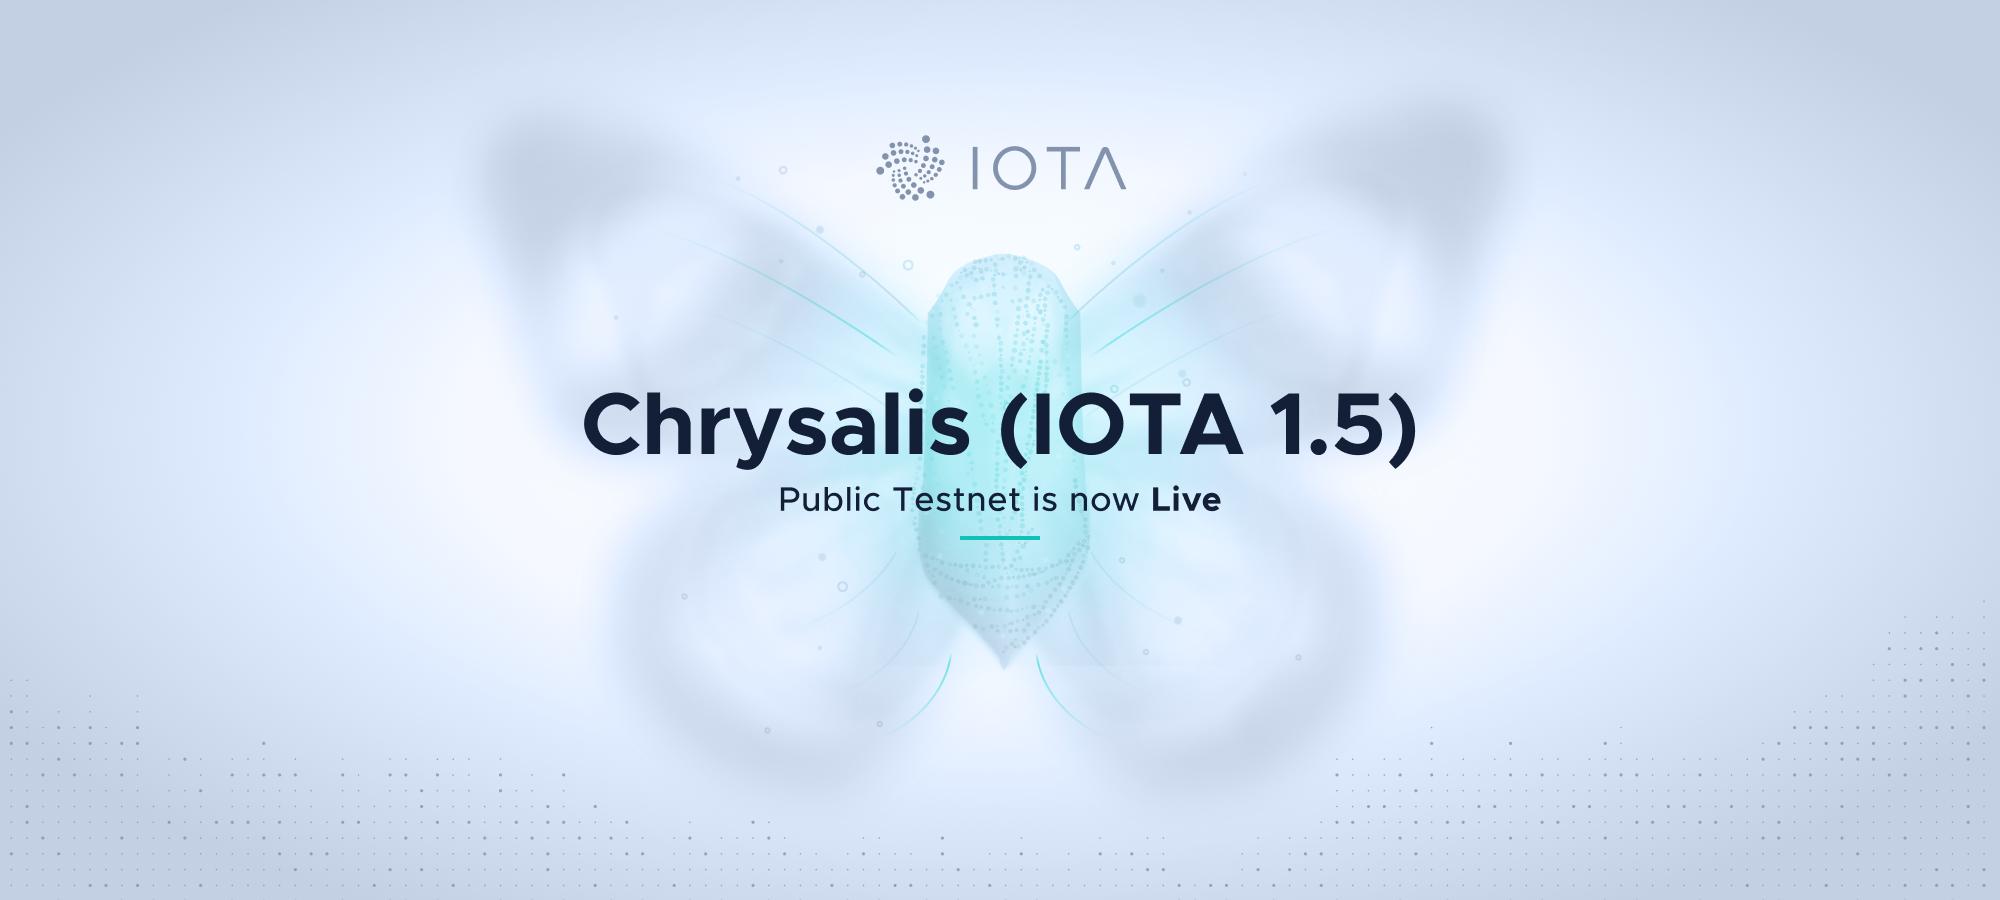 Chrysalis (IOTA 1.5) Public Testnet is Live